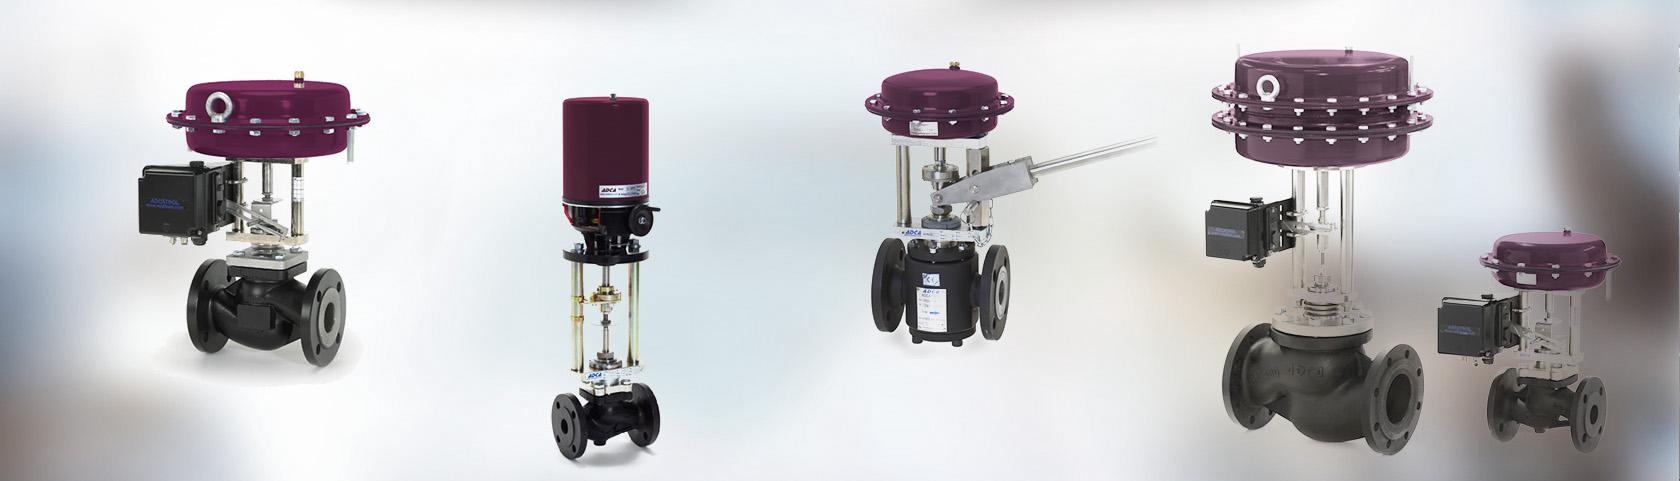 Control-valves